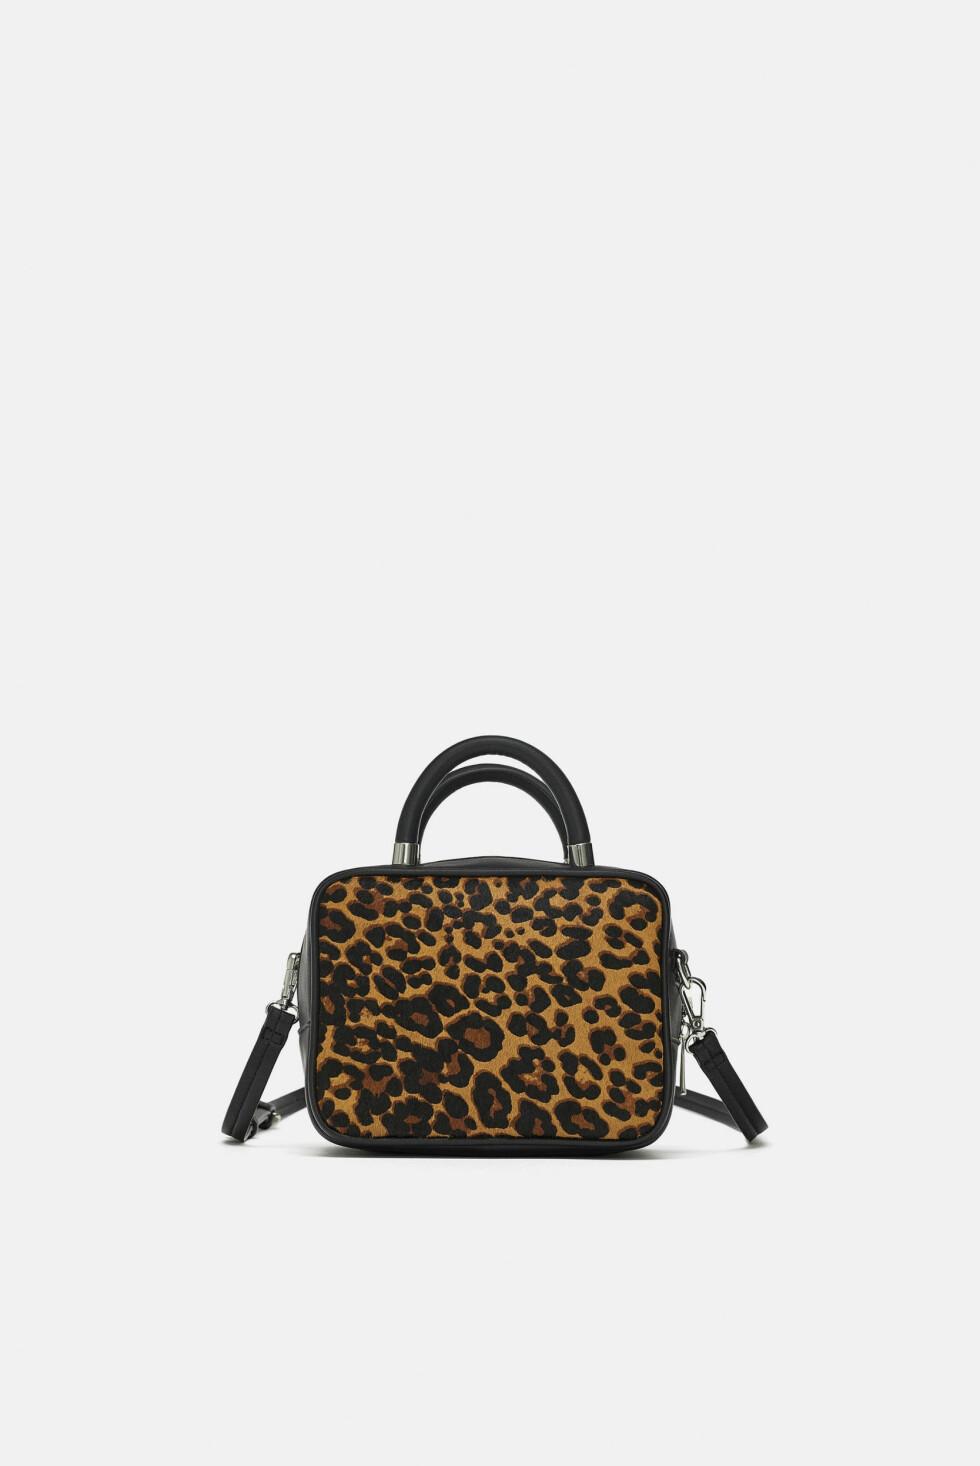 Zara, kr 500